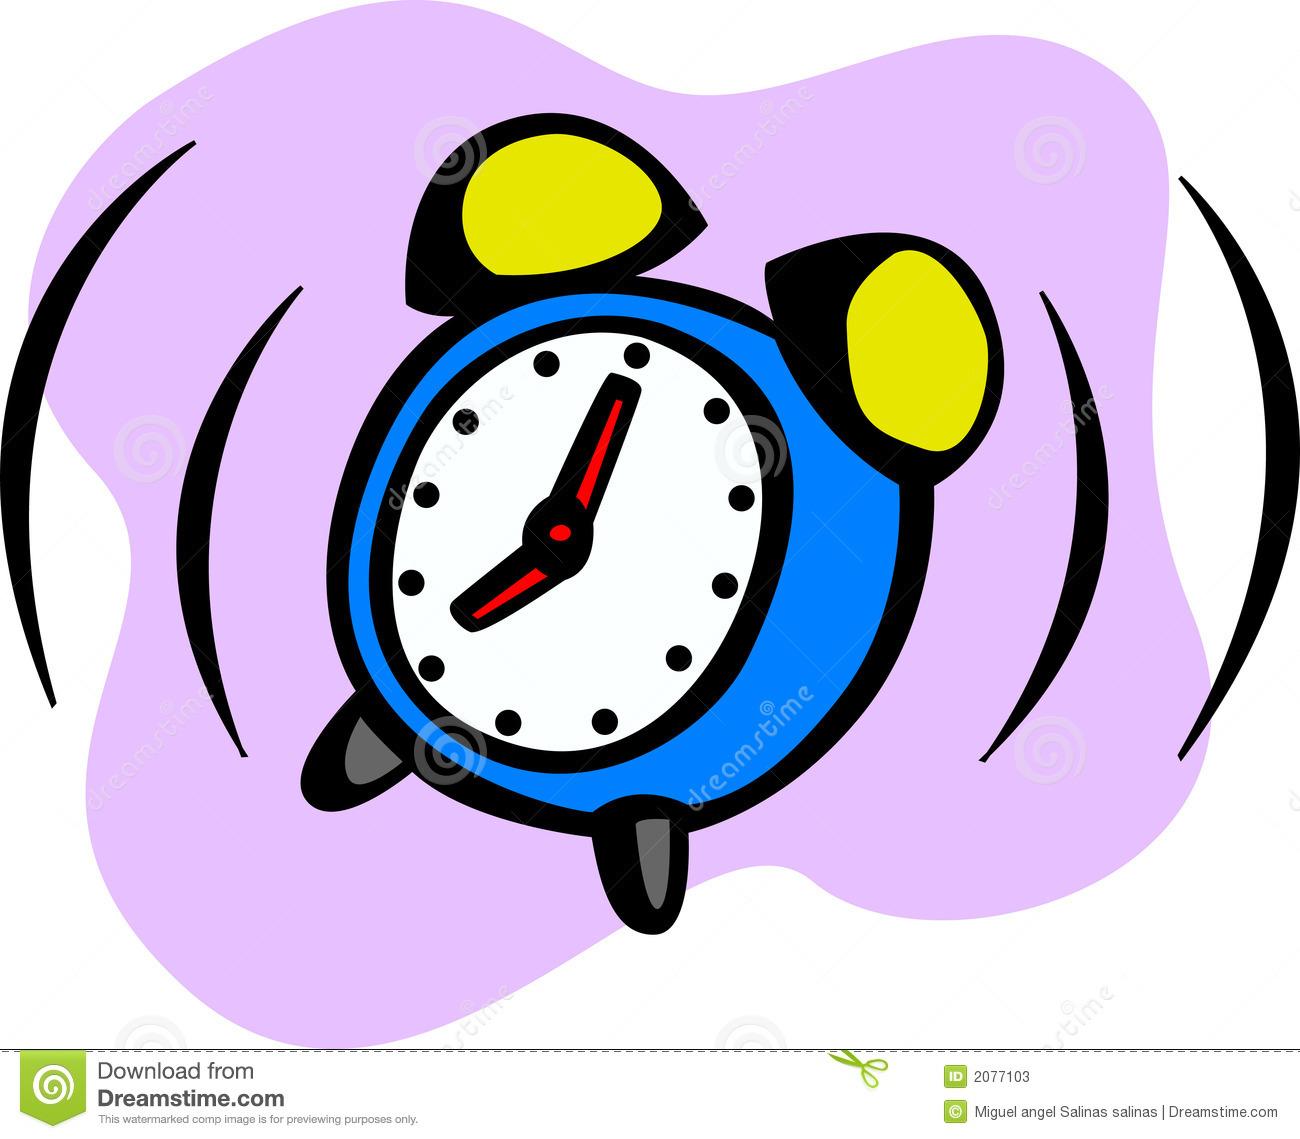 Alarm Clock Clipart | Clipart Panda - Free Clipart Images